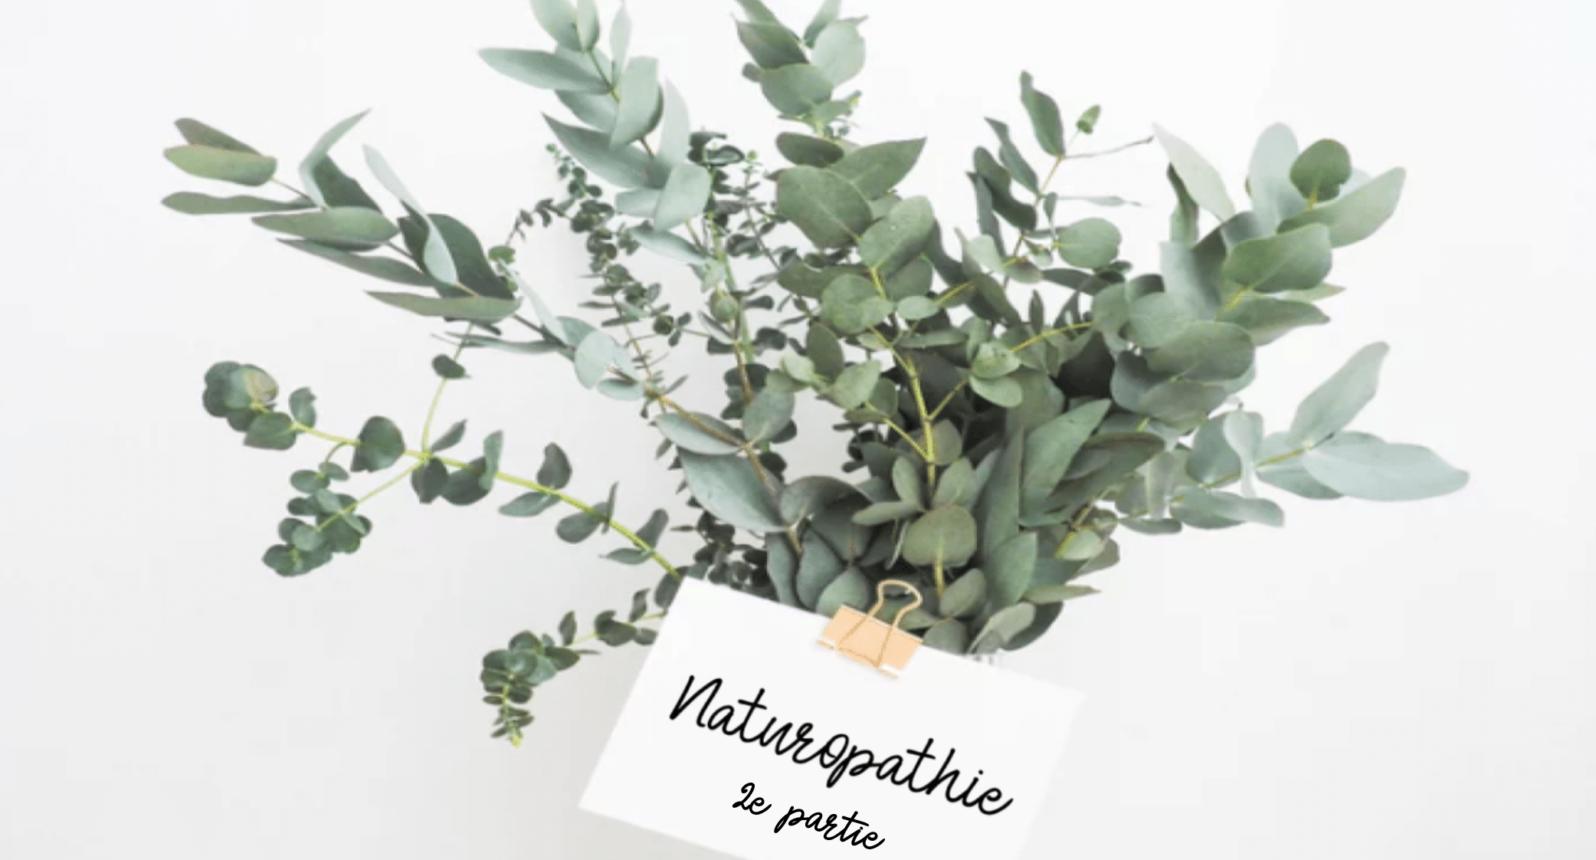 bysohealthy-naturopathie-sonia-robino-entretien-2